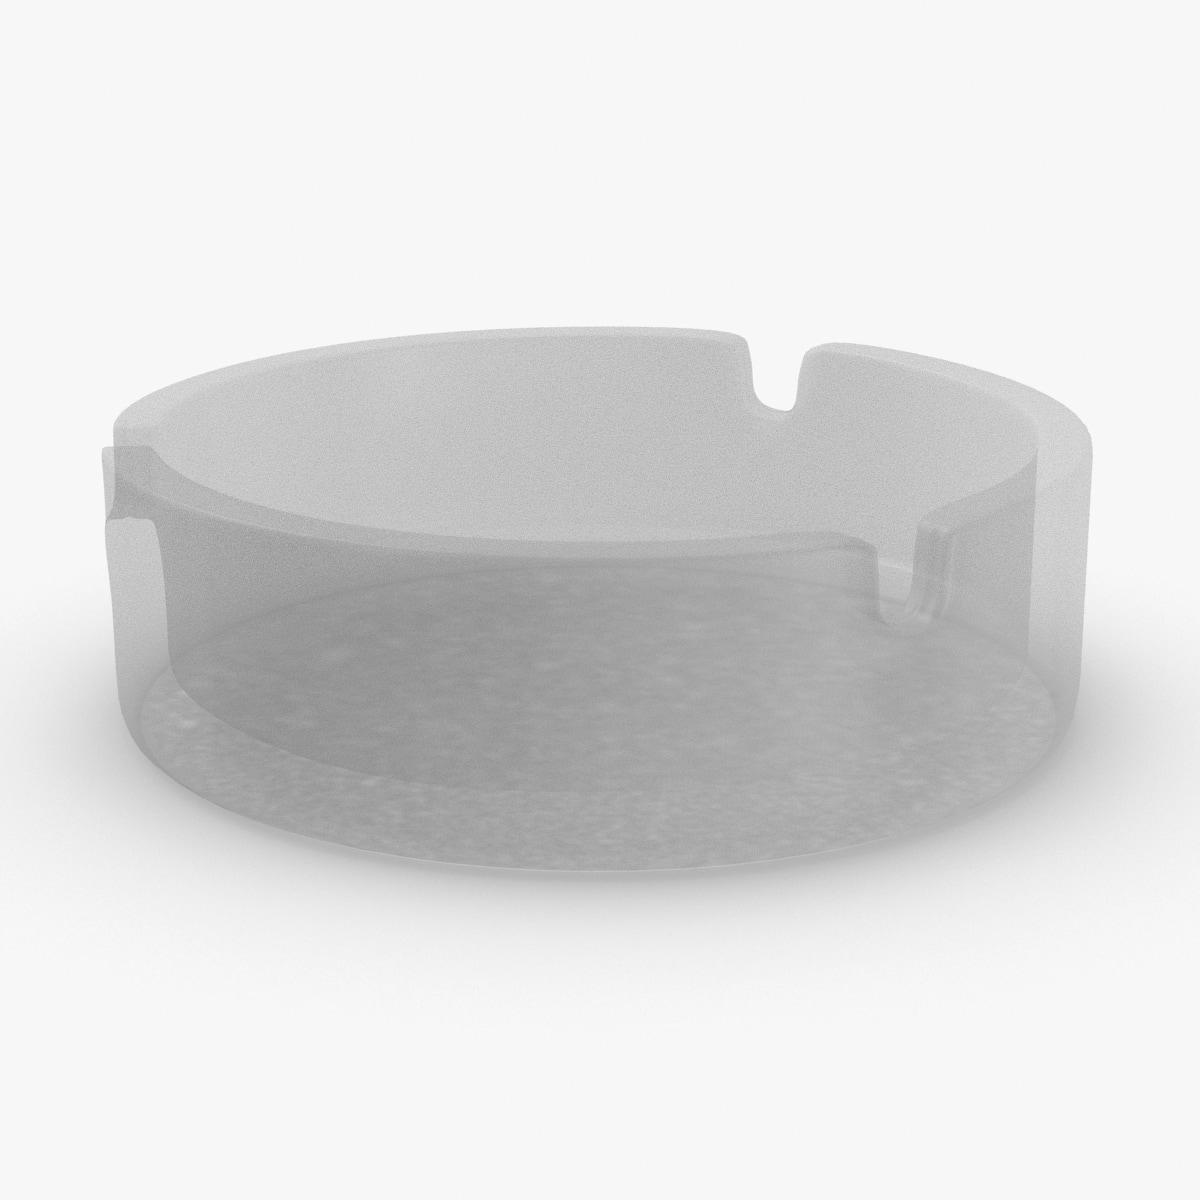 ash-tray-02---stem-cell 3D model